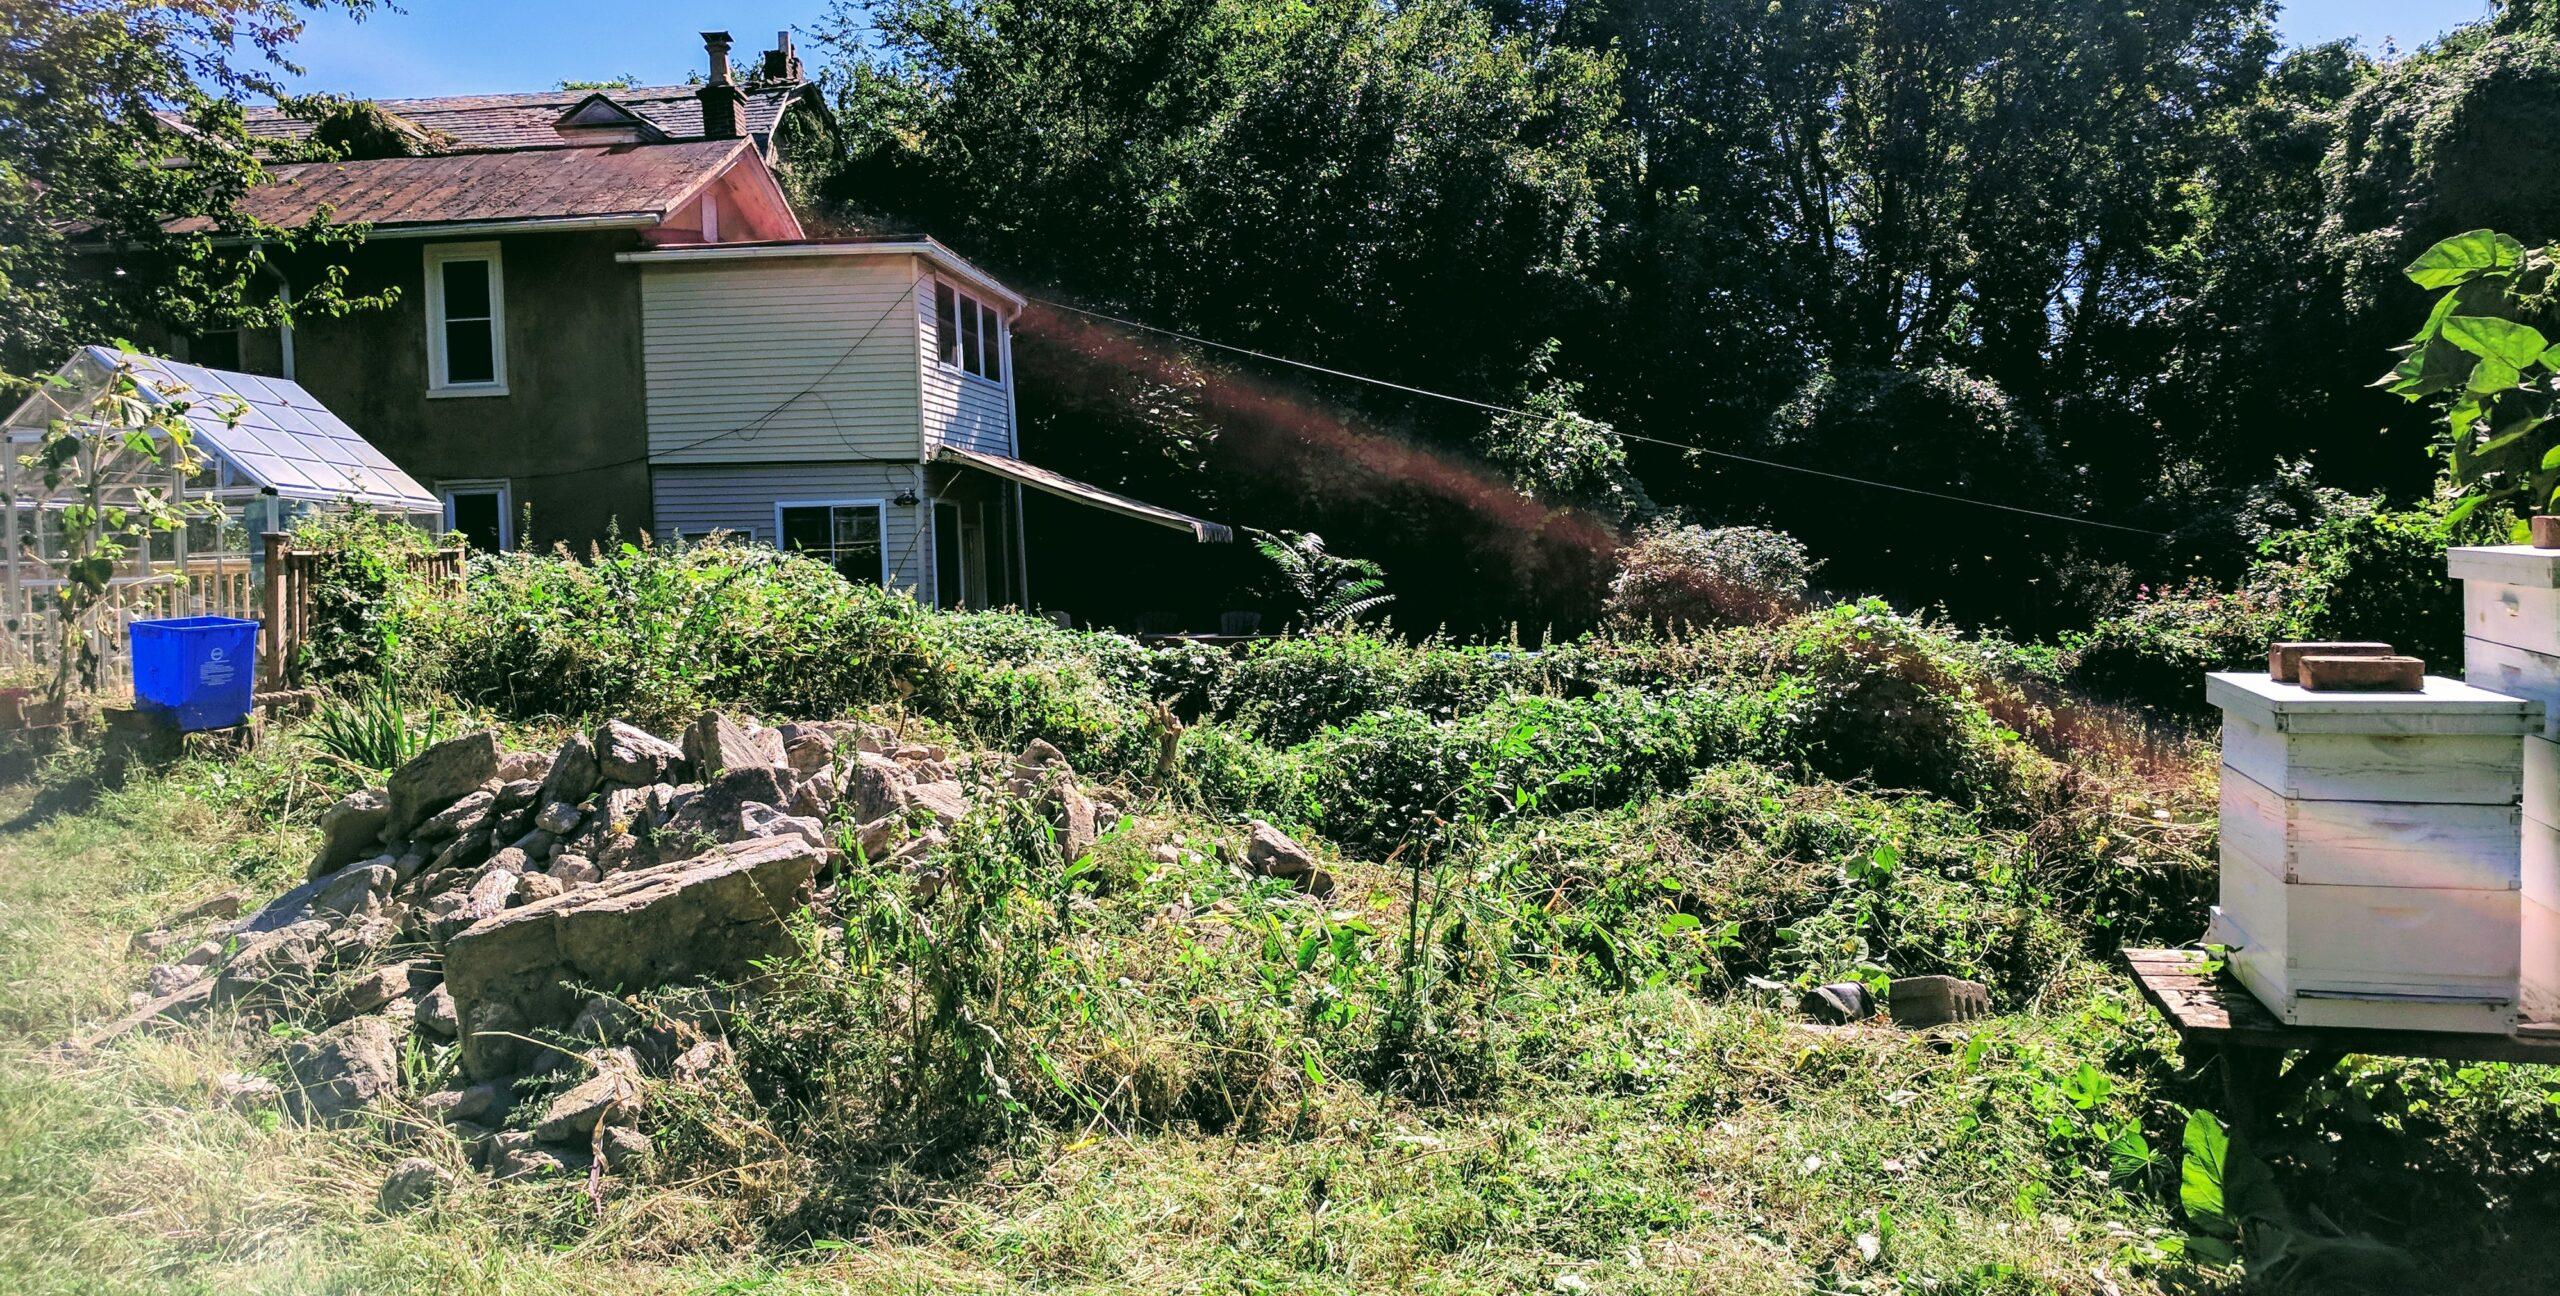 photo of pile of stones beside grassy area in garden